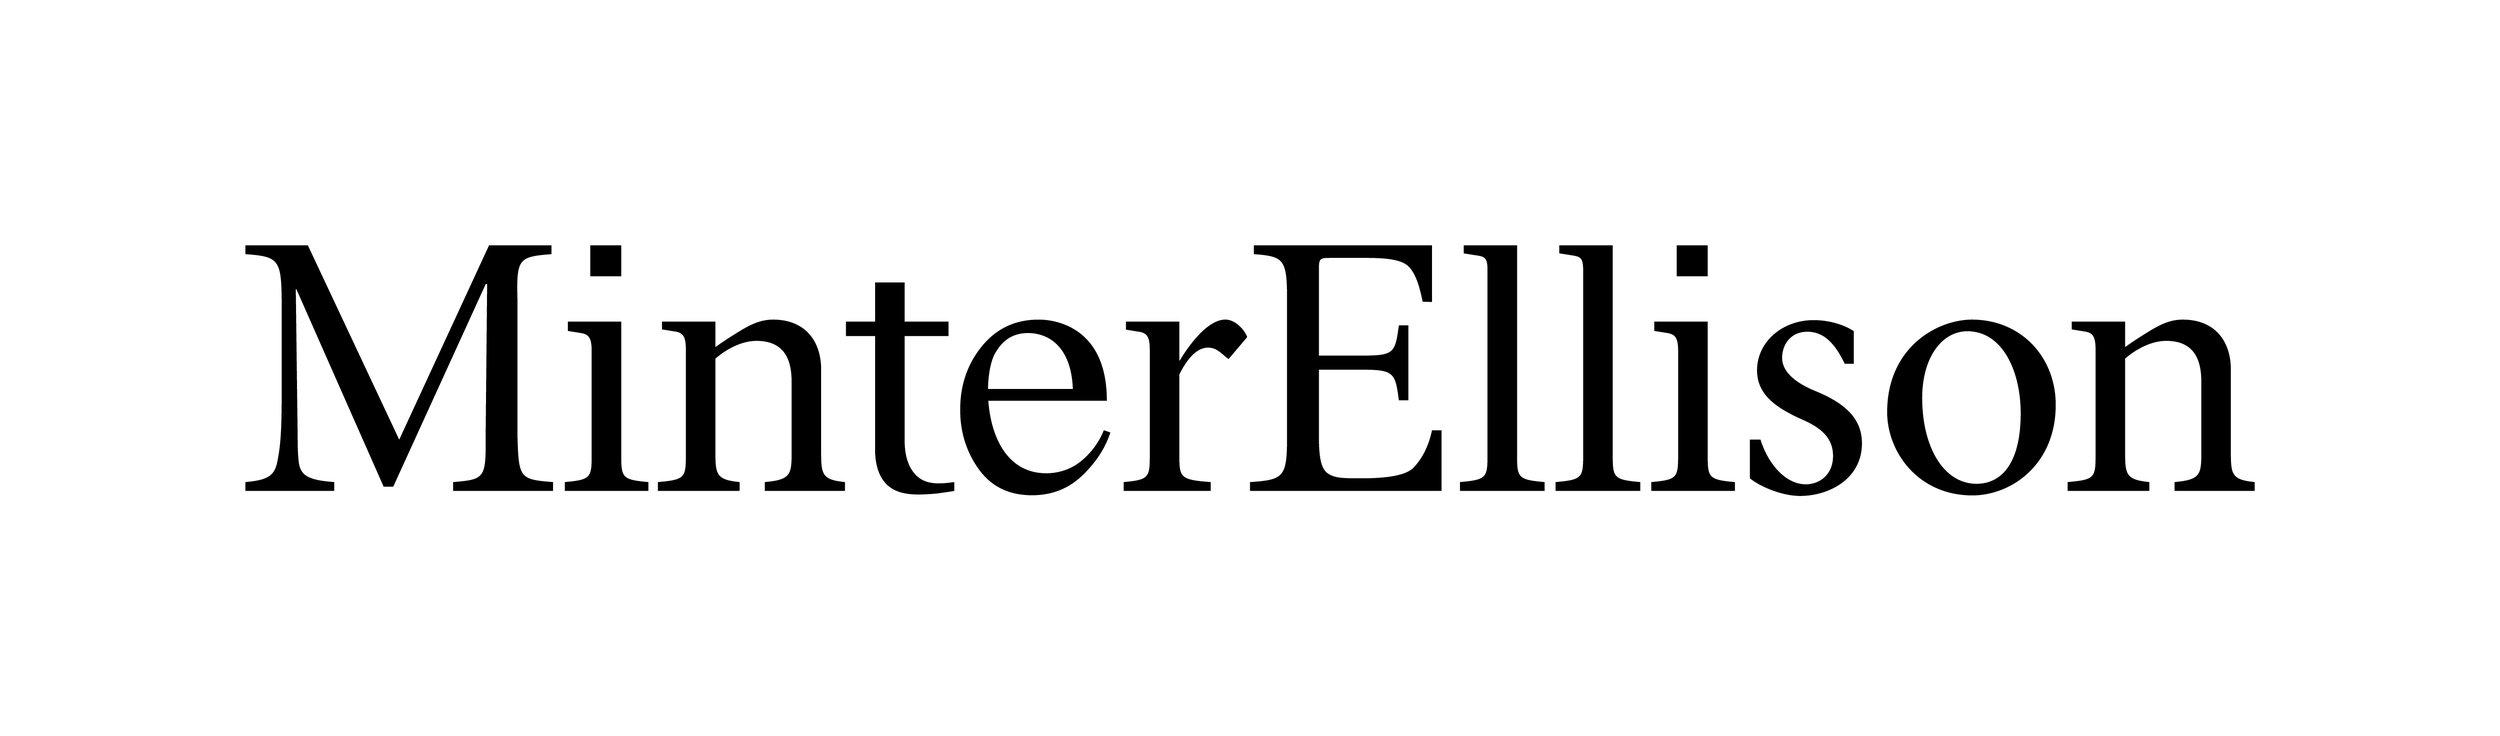 MinterEllison_Logo.jpg